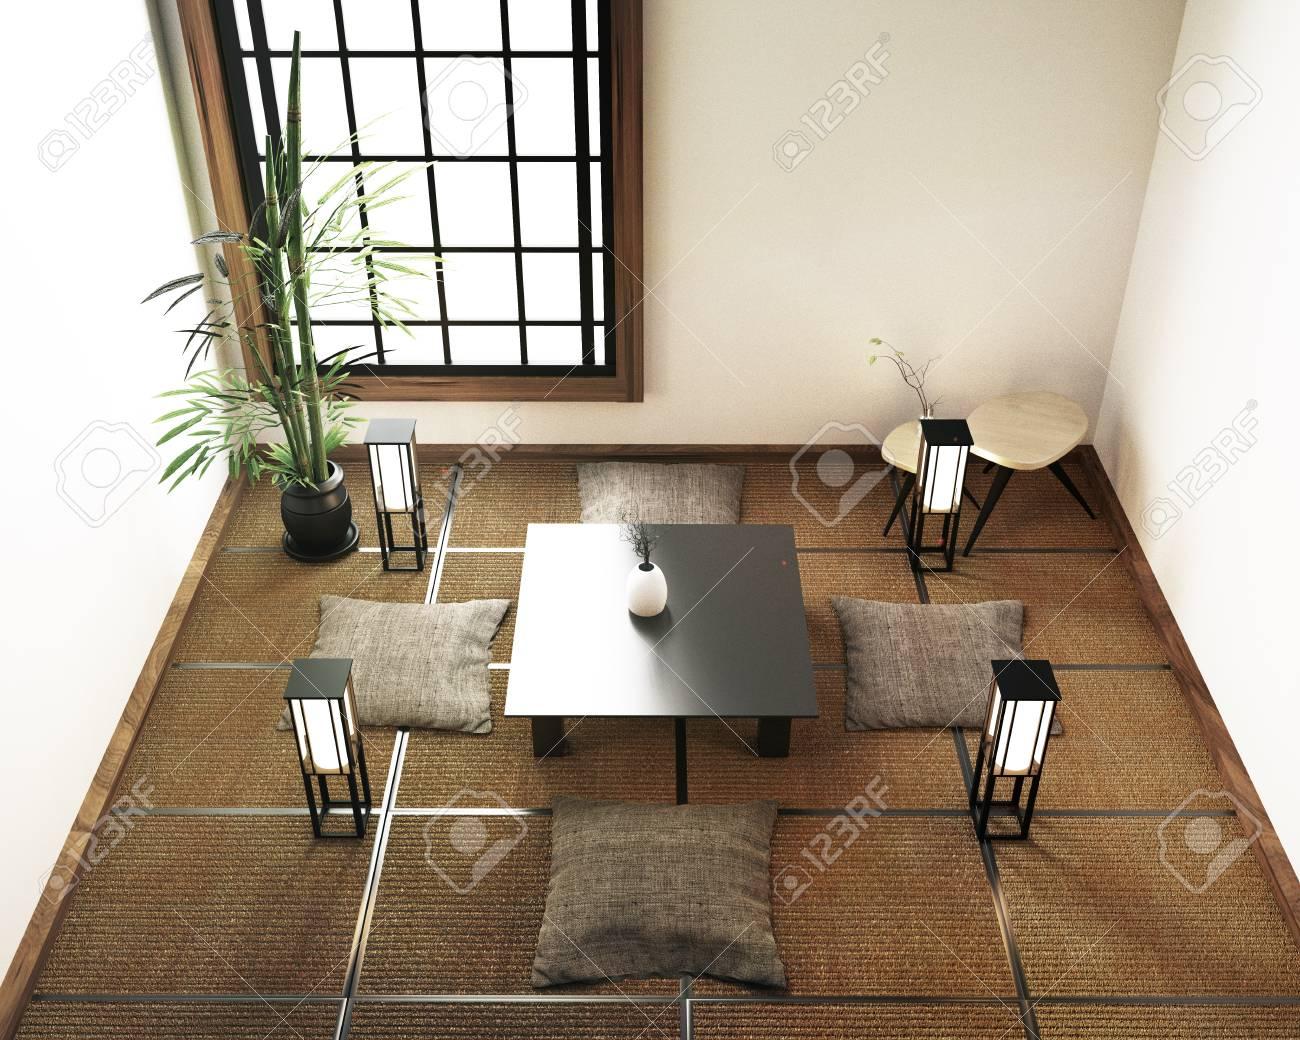 interior design living room with table,tatami mat floor. 3d rendering